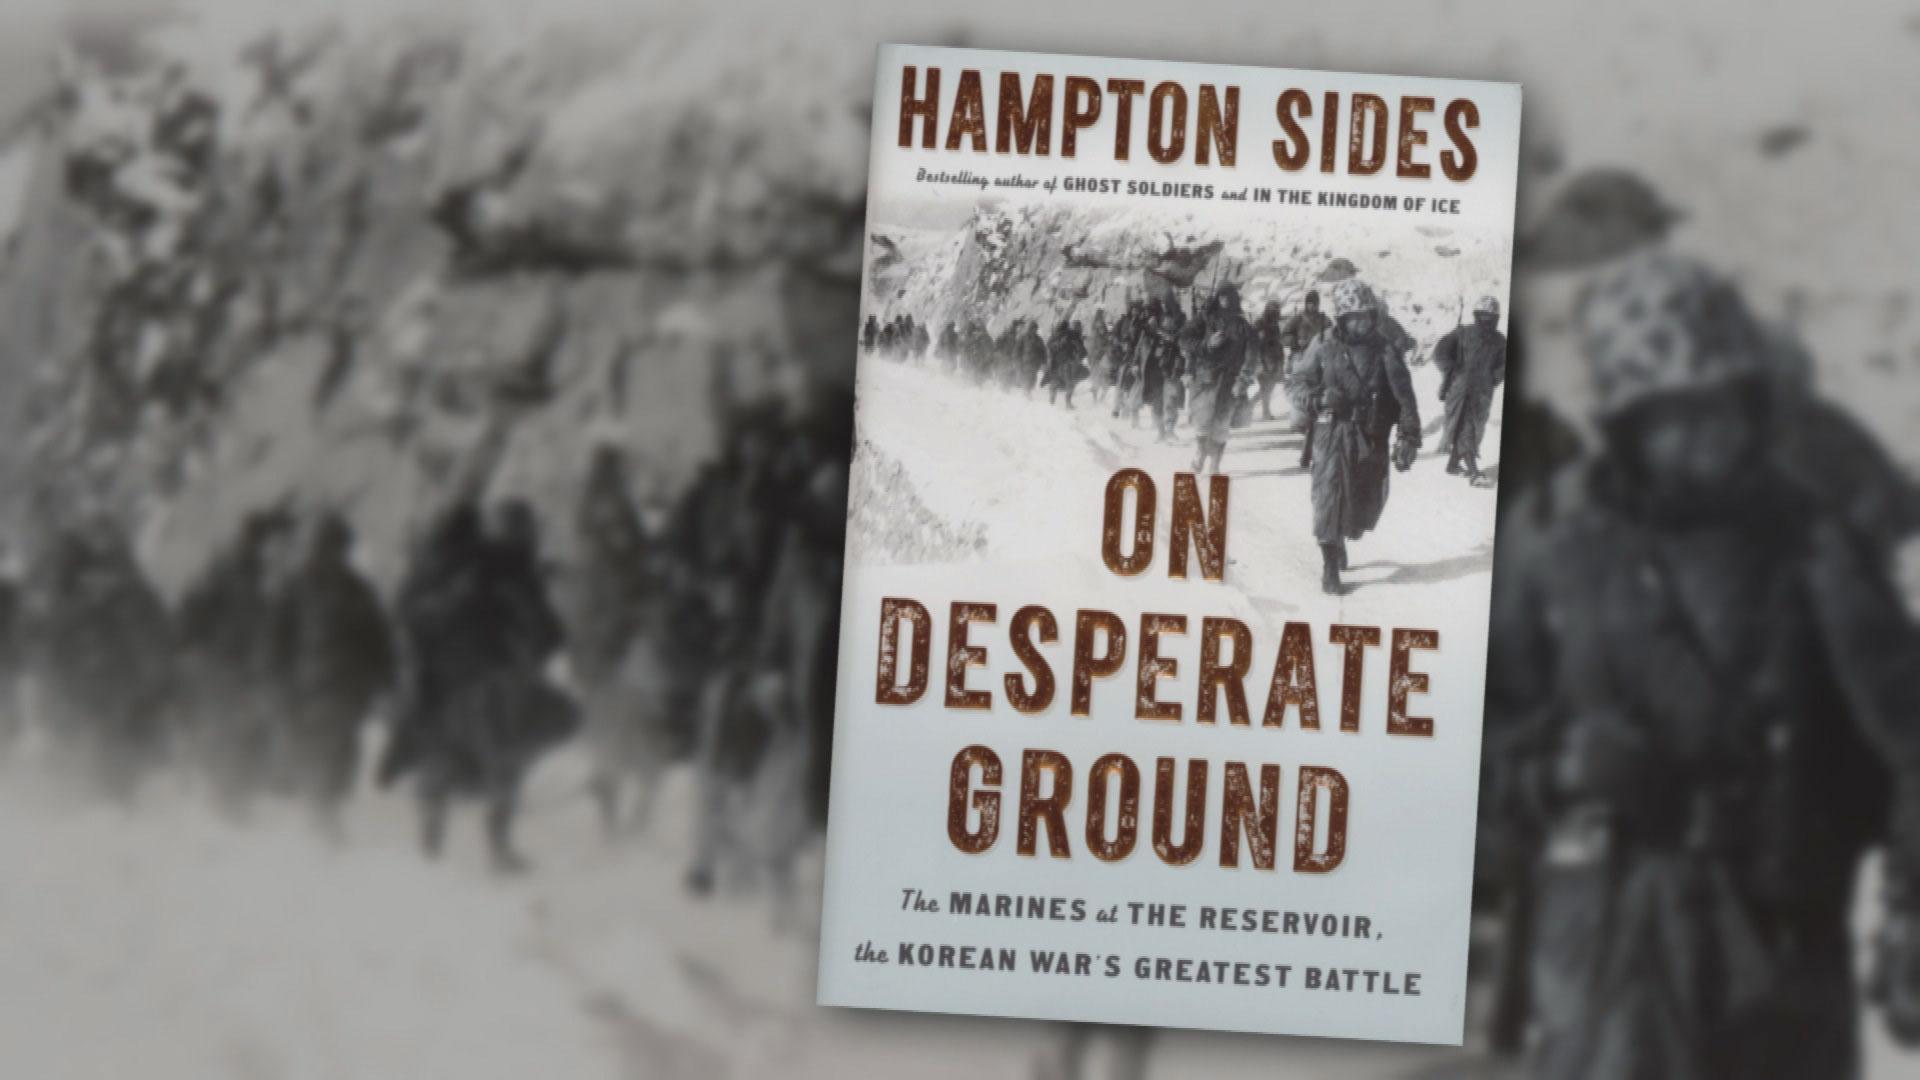 Hampton Sides On Desperate Ground